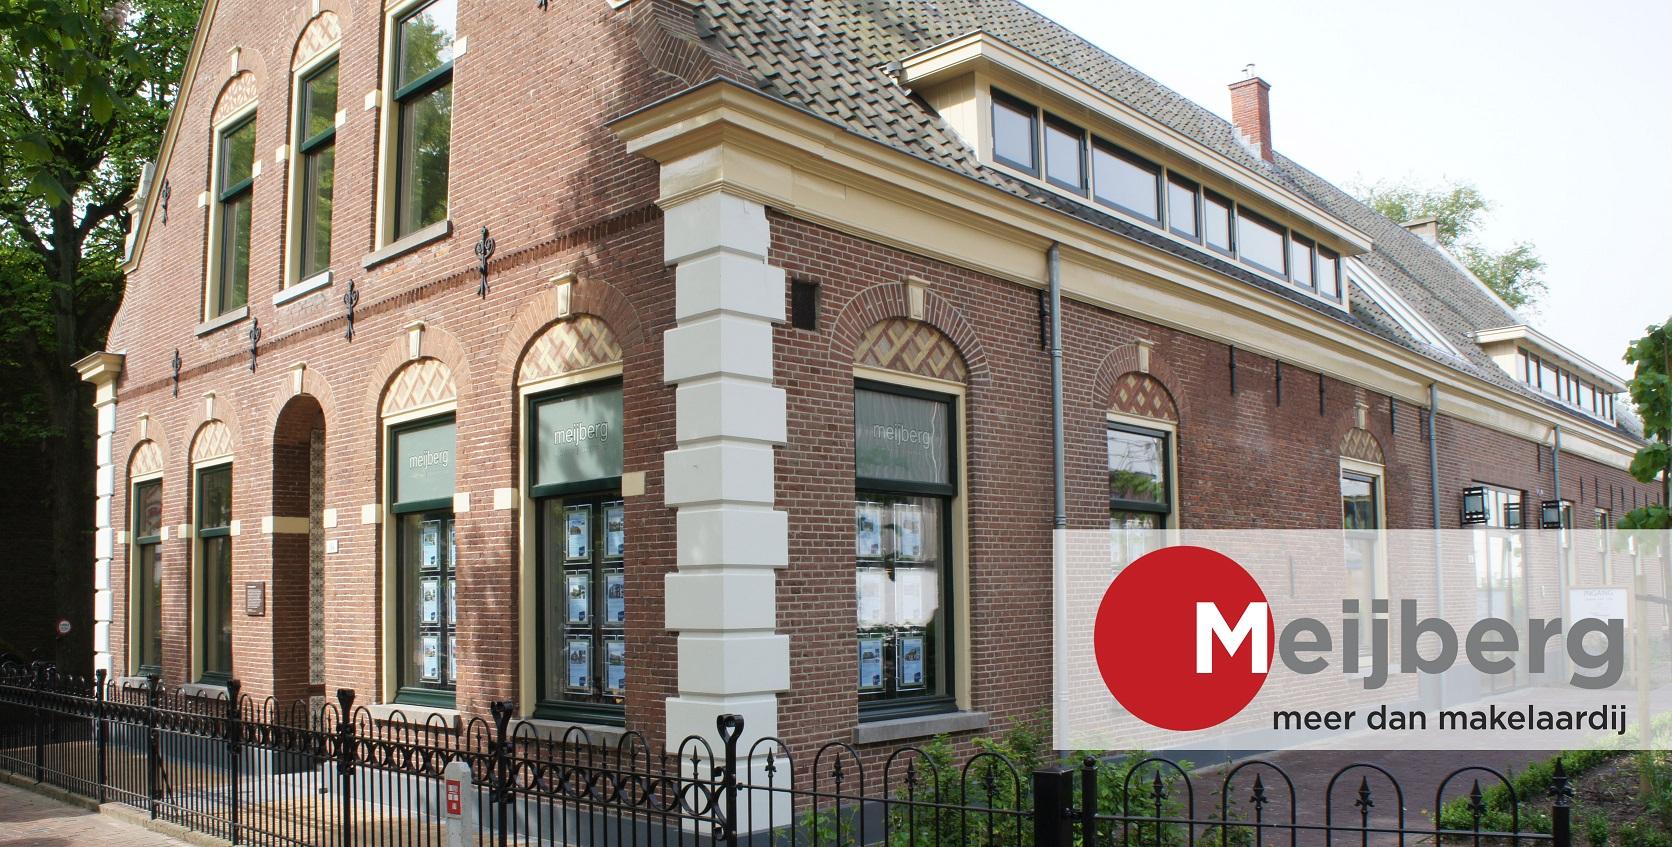 Kantoor Vestiging Meijberg Makelaars & Taxateurs o.g. B.V.